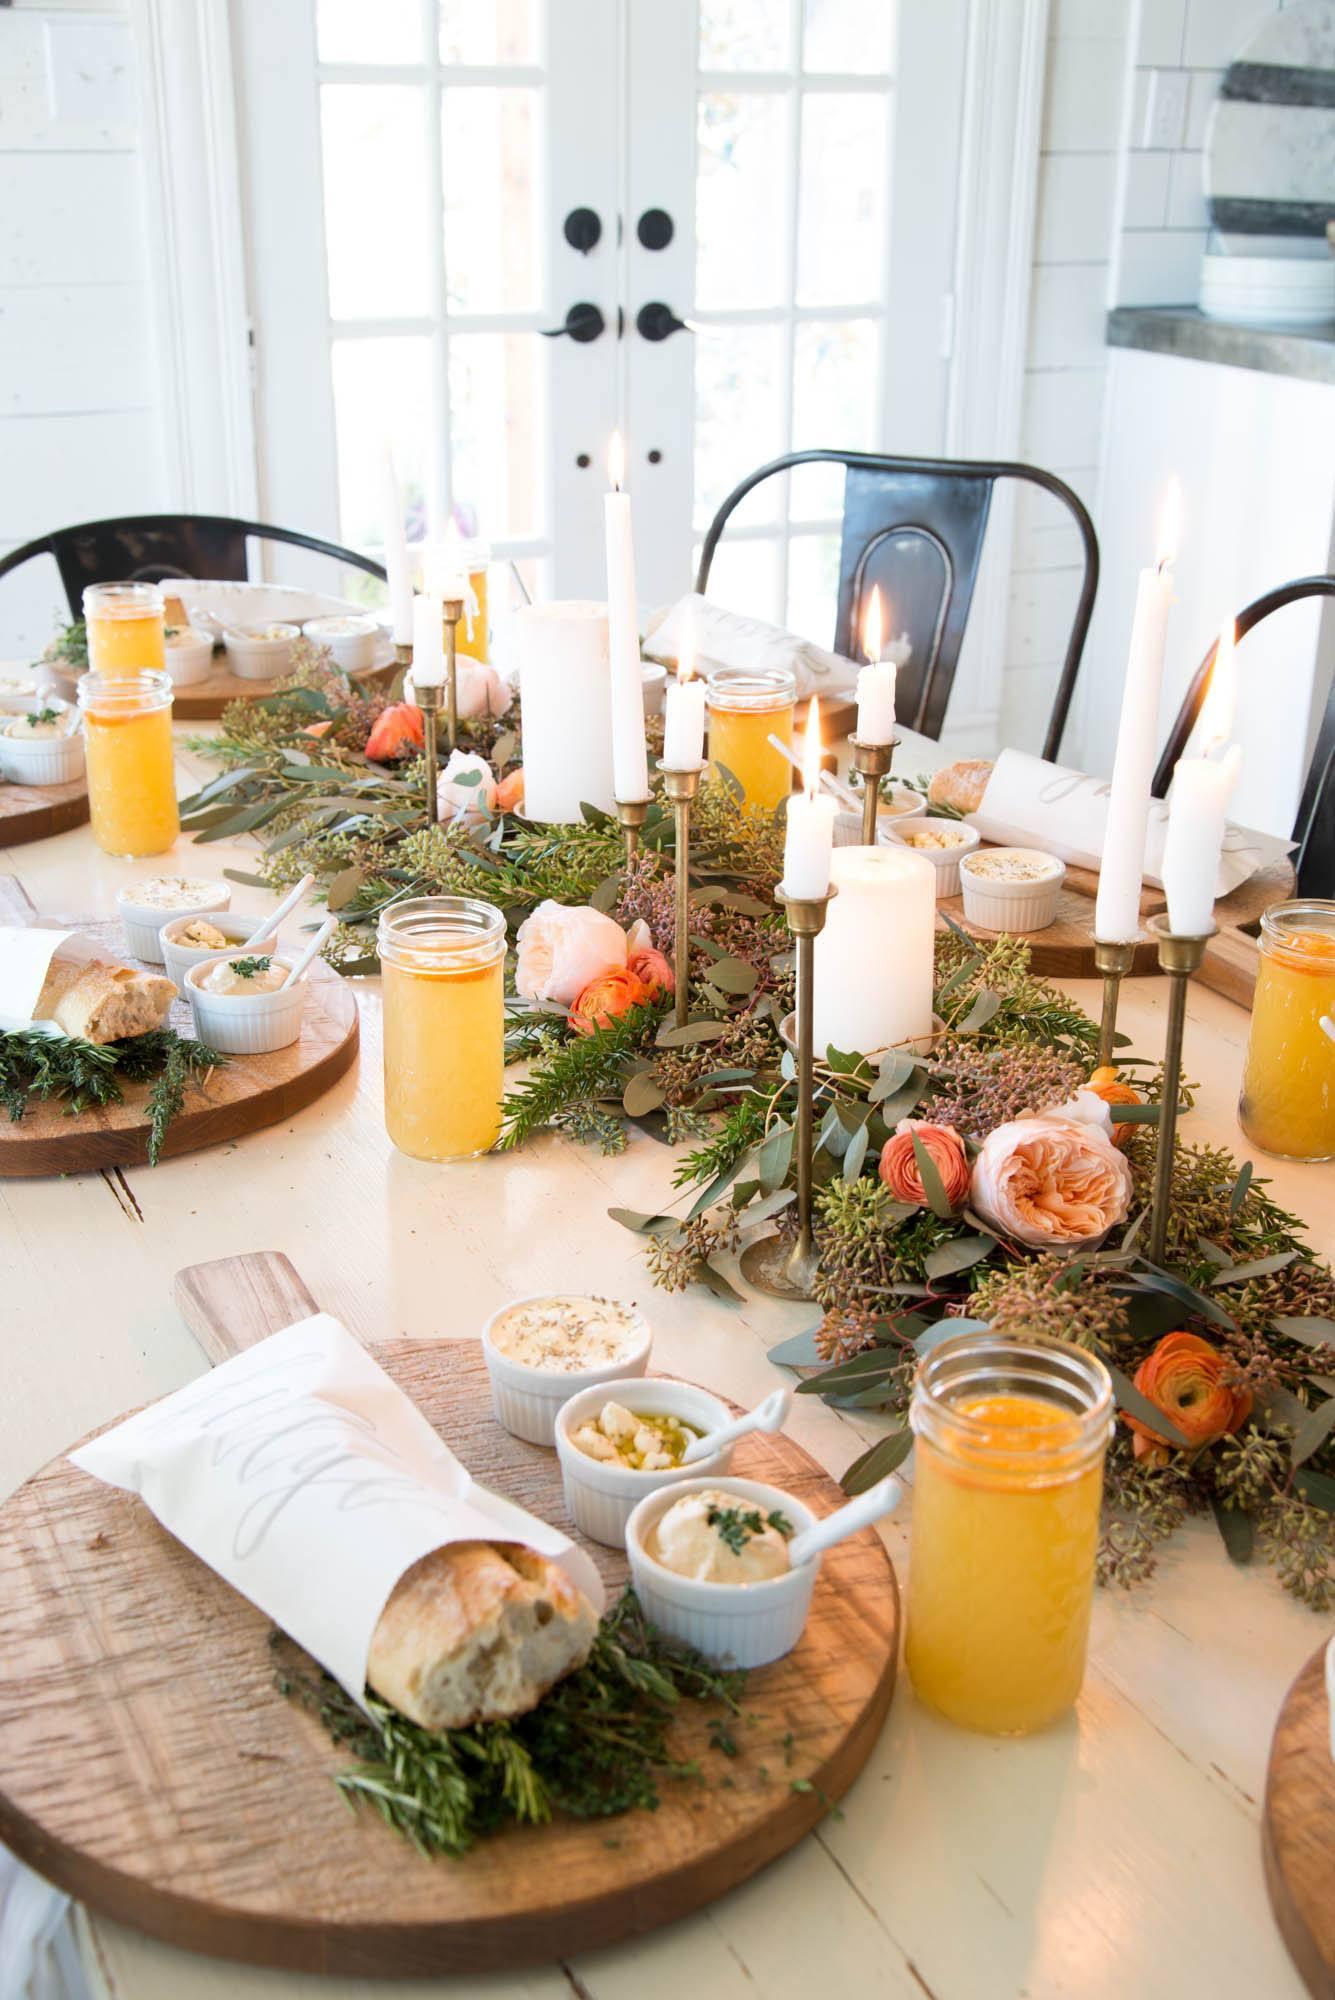 Joanna Gaines table setting